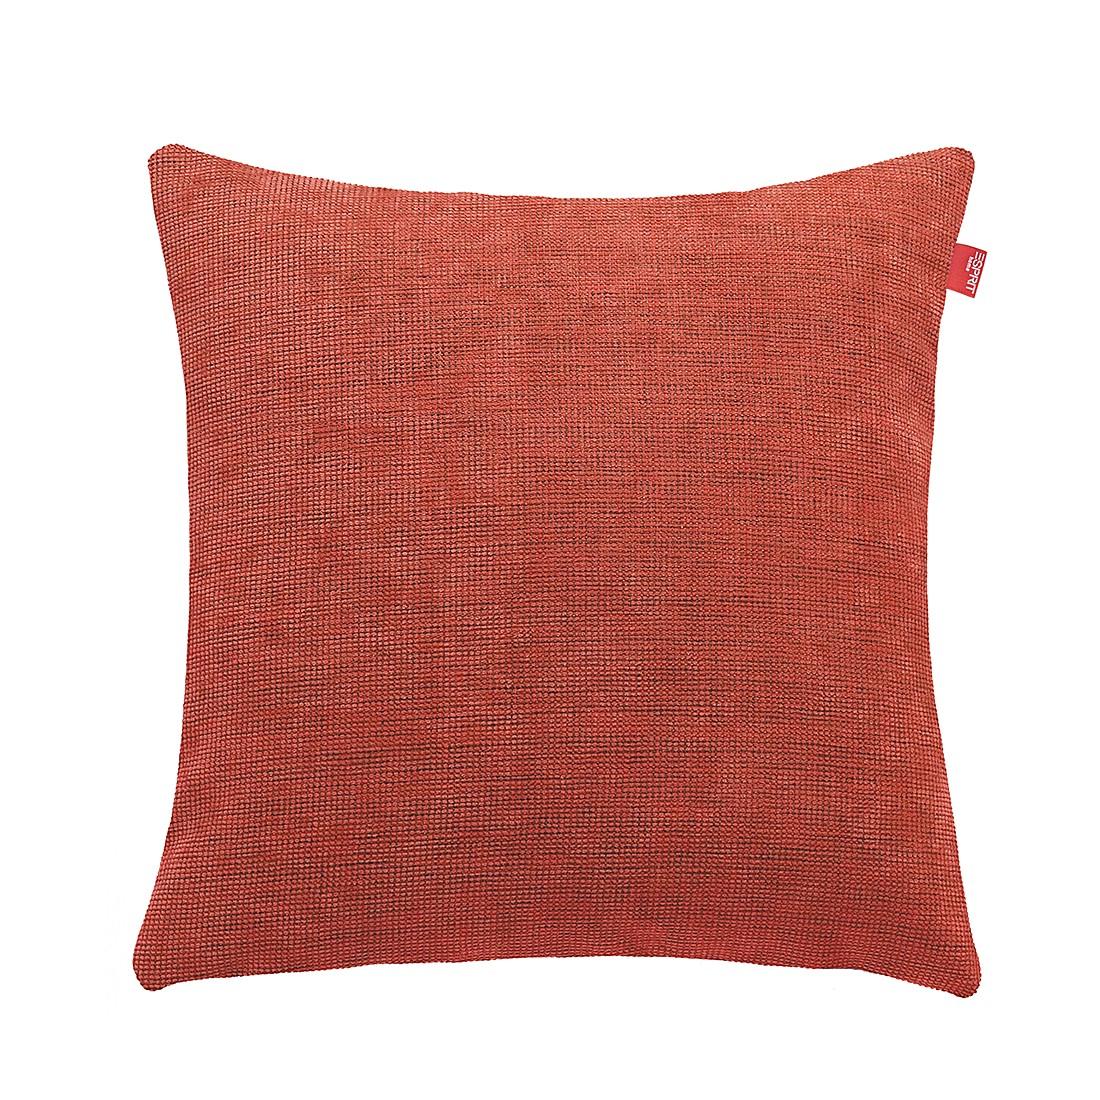 Kissenhülle E-Base – Rot – Größe: 50 x 50 cm, Esprit Home günstig kaufen